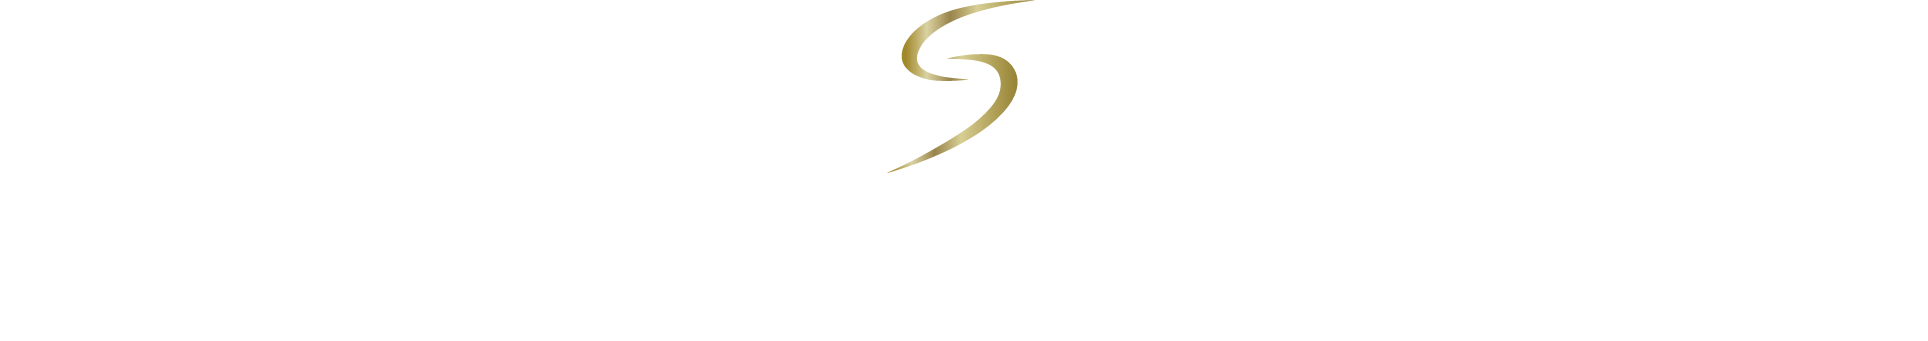 Scandinavian resorts